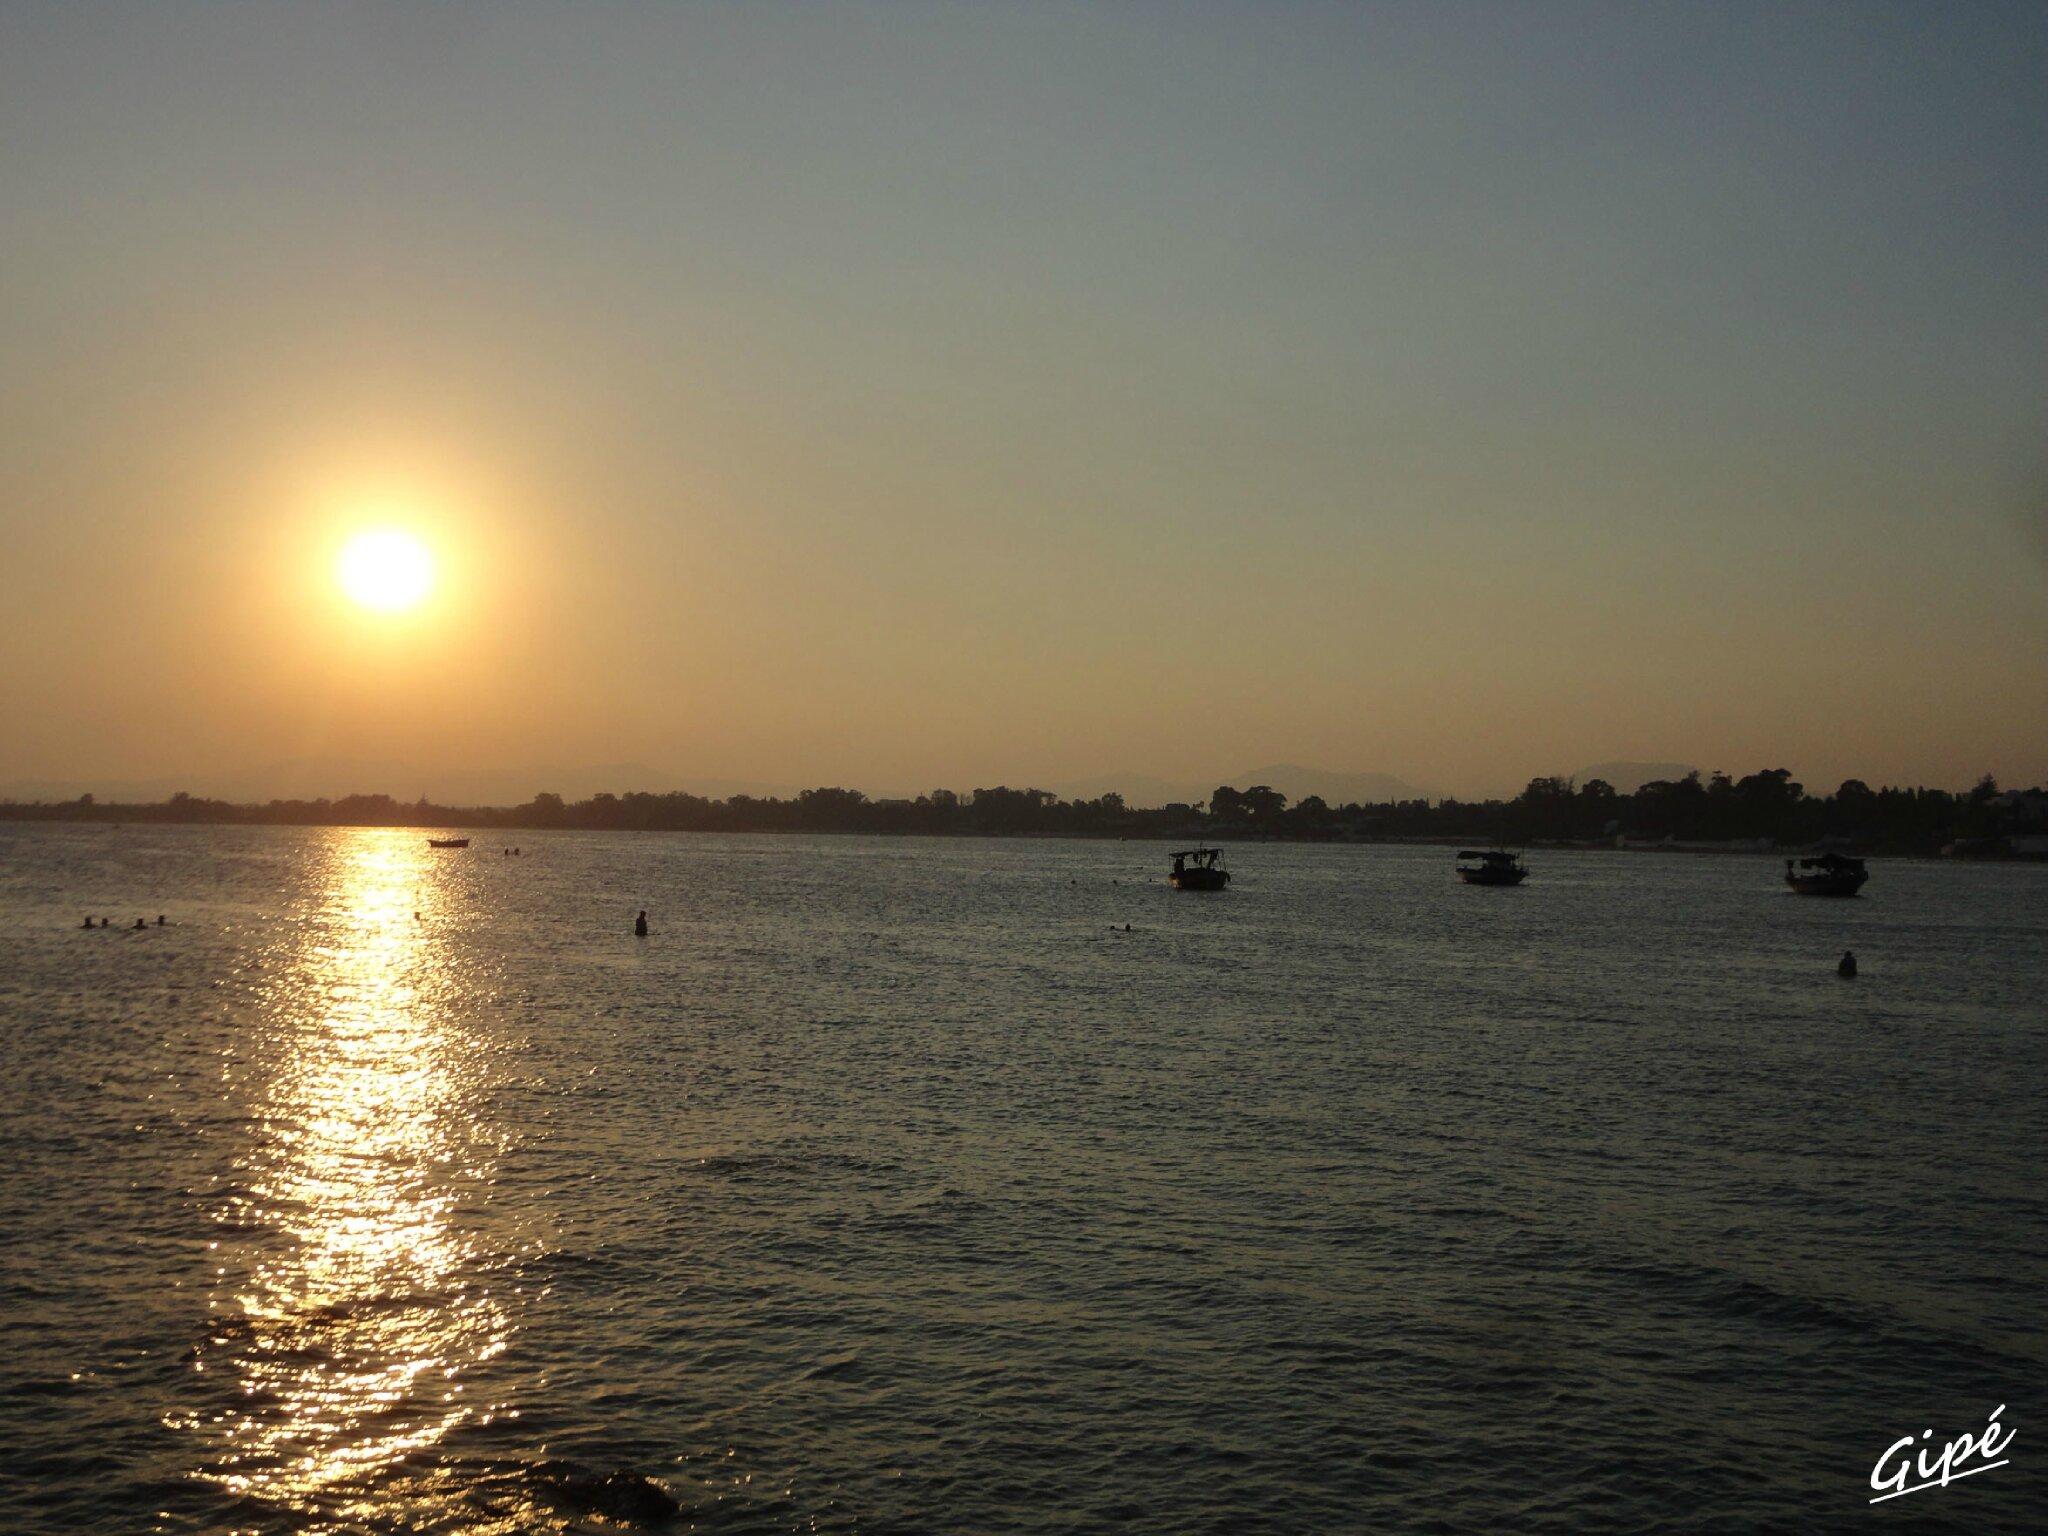 Coucher de soleil du mercredi 24 juillet 2013